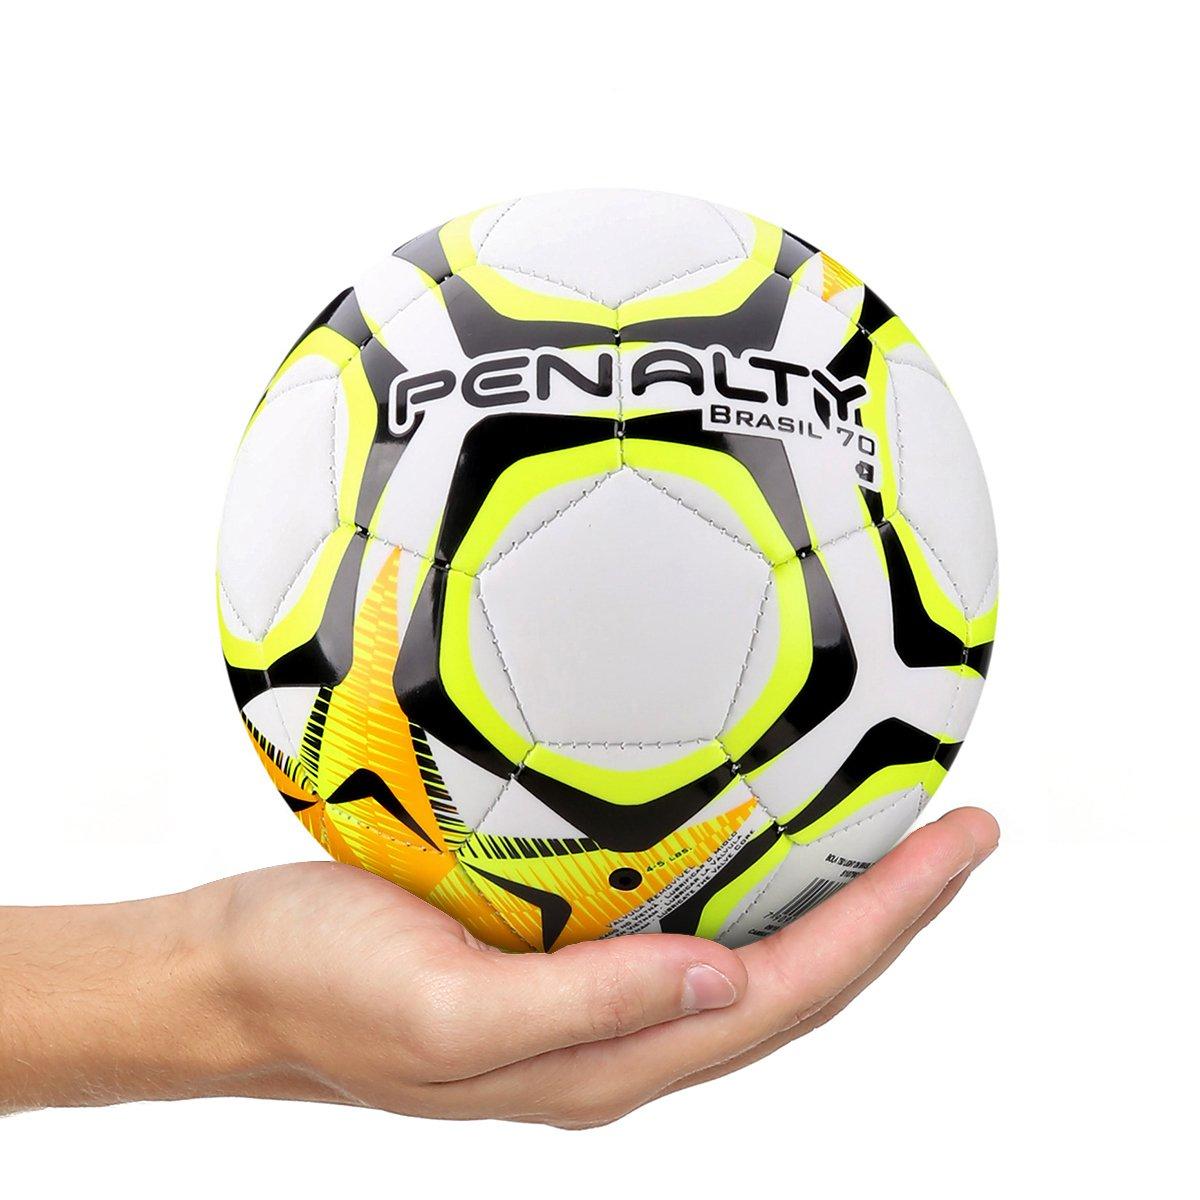 d8a435c1bd Mini Bola Futebol Penalty Brasil 70 IX